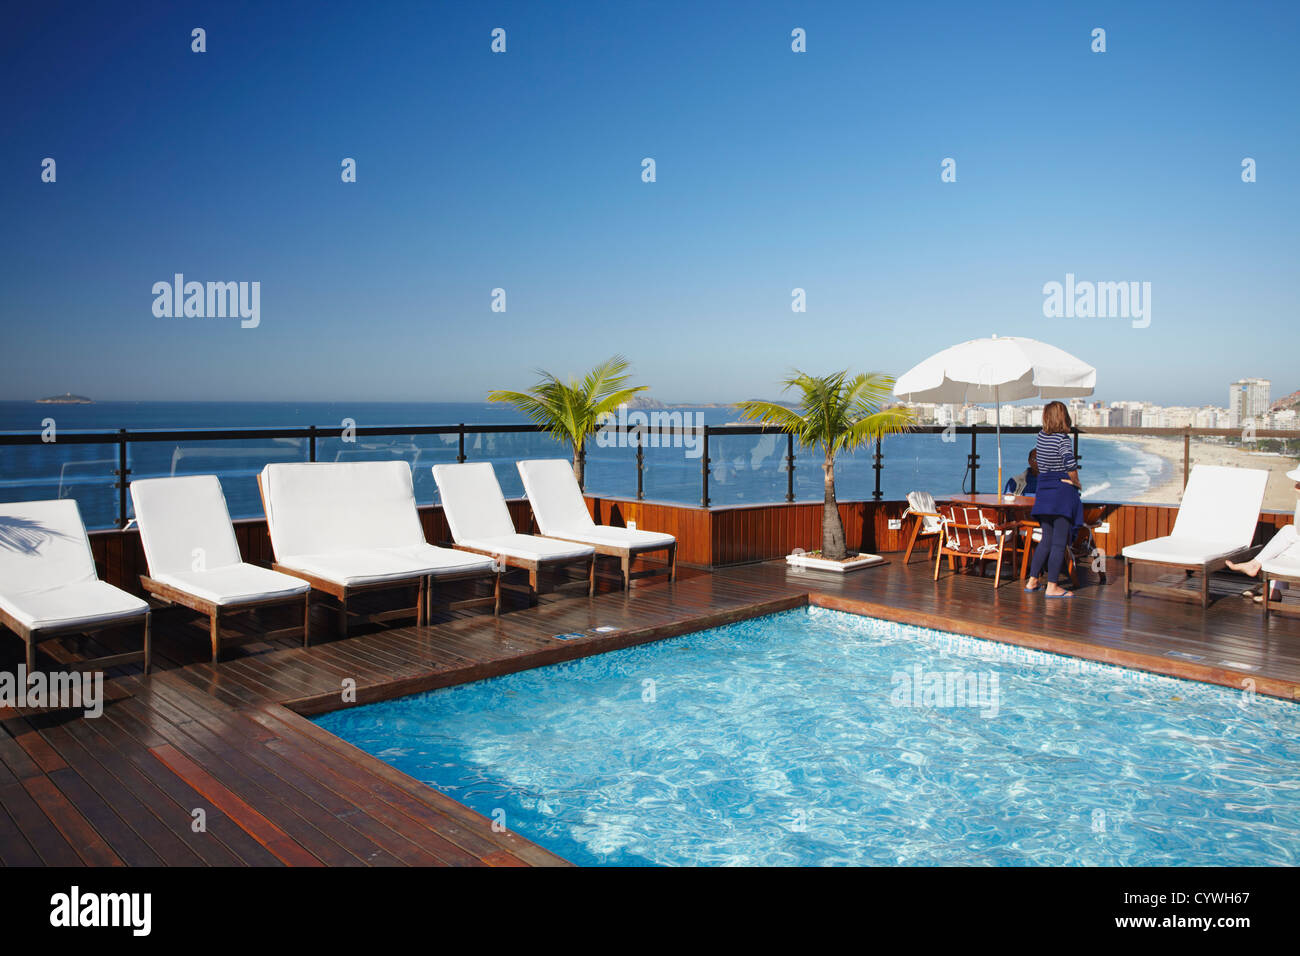 Rooftop Pool In Porto Bay Rio Hotel Copacabana Rio De Janeiro Stock Photo Royalty Free Image